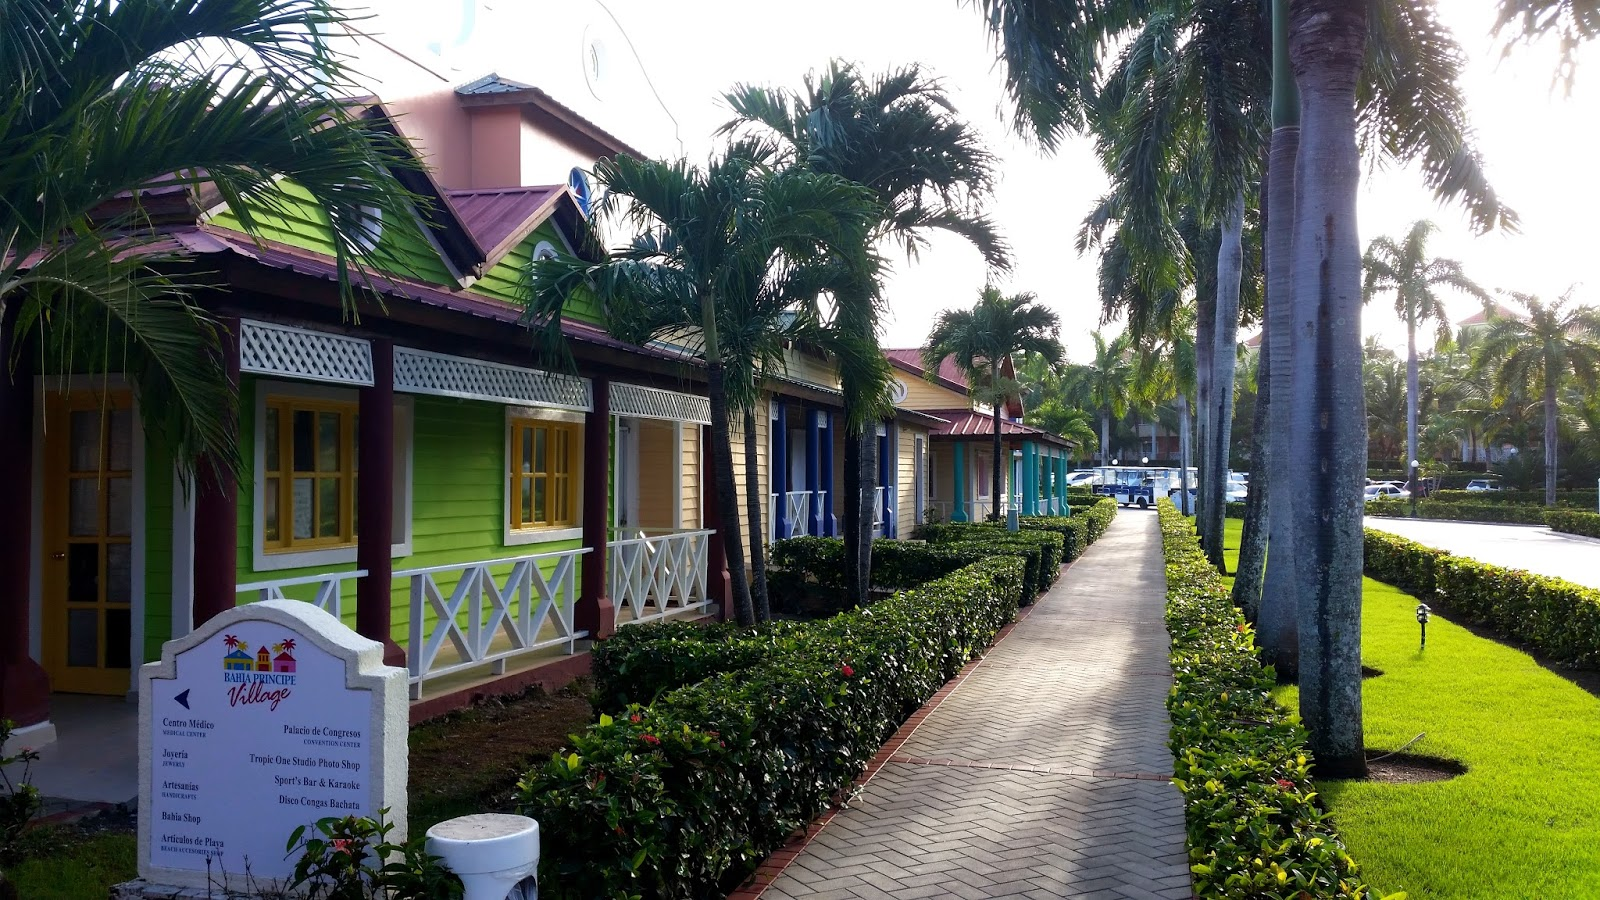 Dominikana bahia principe hotel